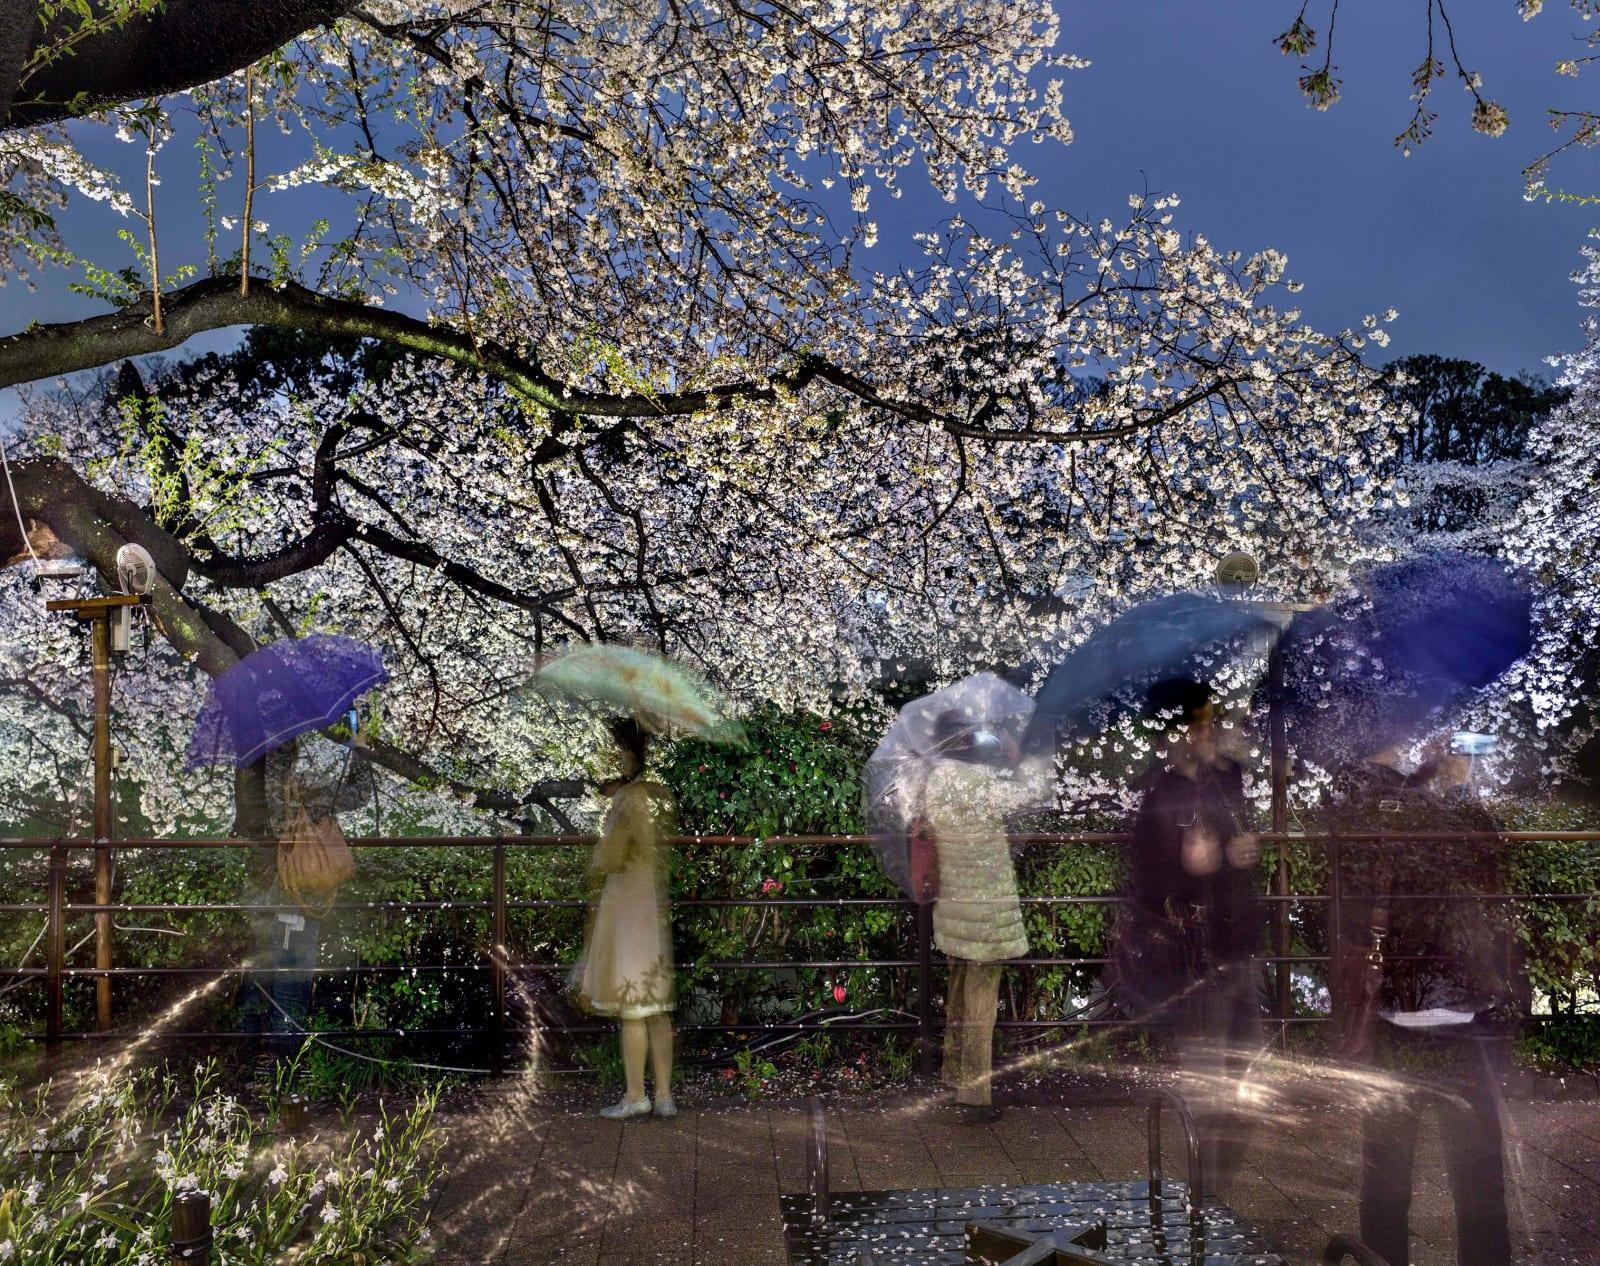 Matthew Pillsbury photograph of people with umbrellas underneath cherry blossom trees at night portrayed through long exposure shot